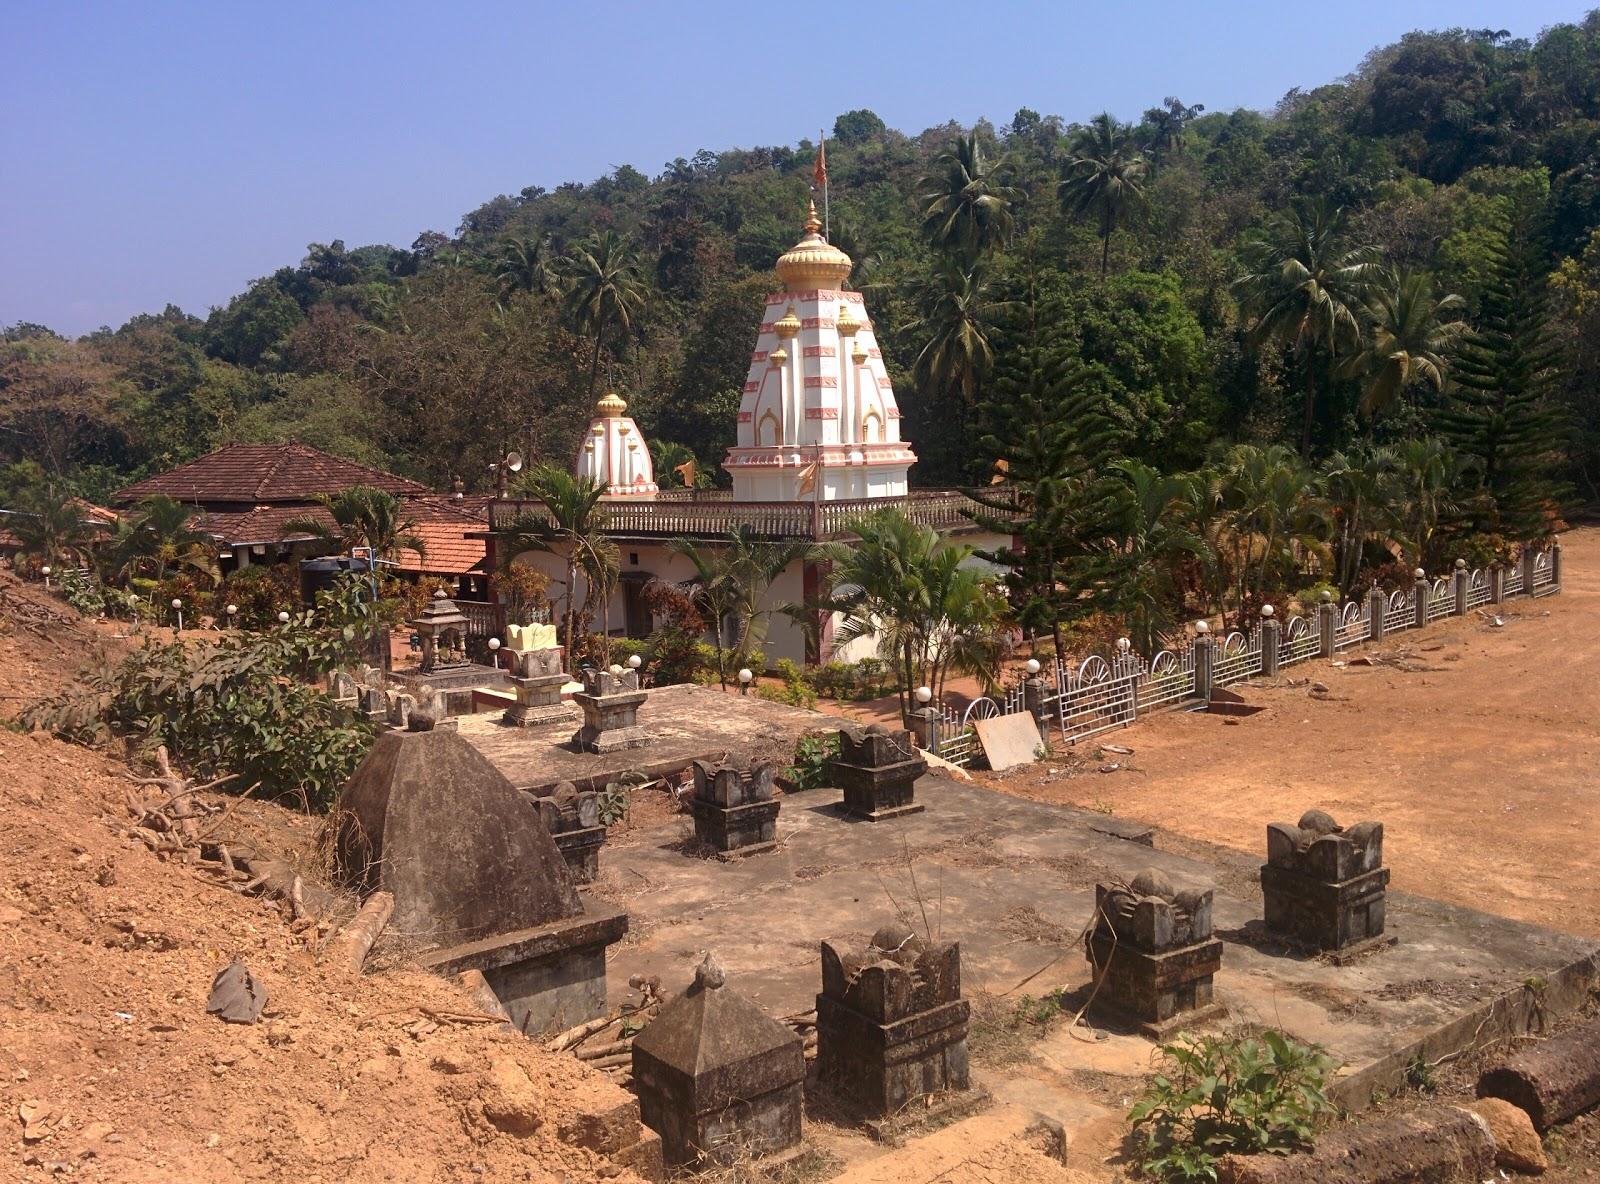 Best Place to Visit in Vengurla-Sateridevi Jal Mandir